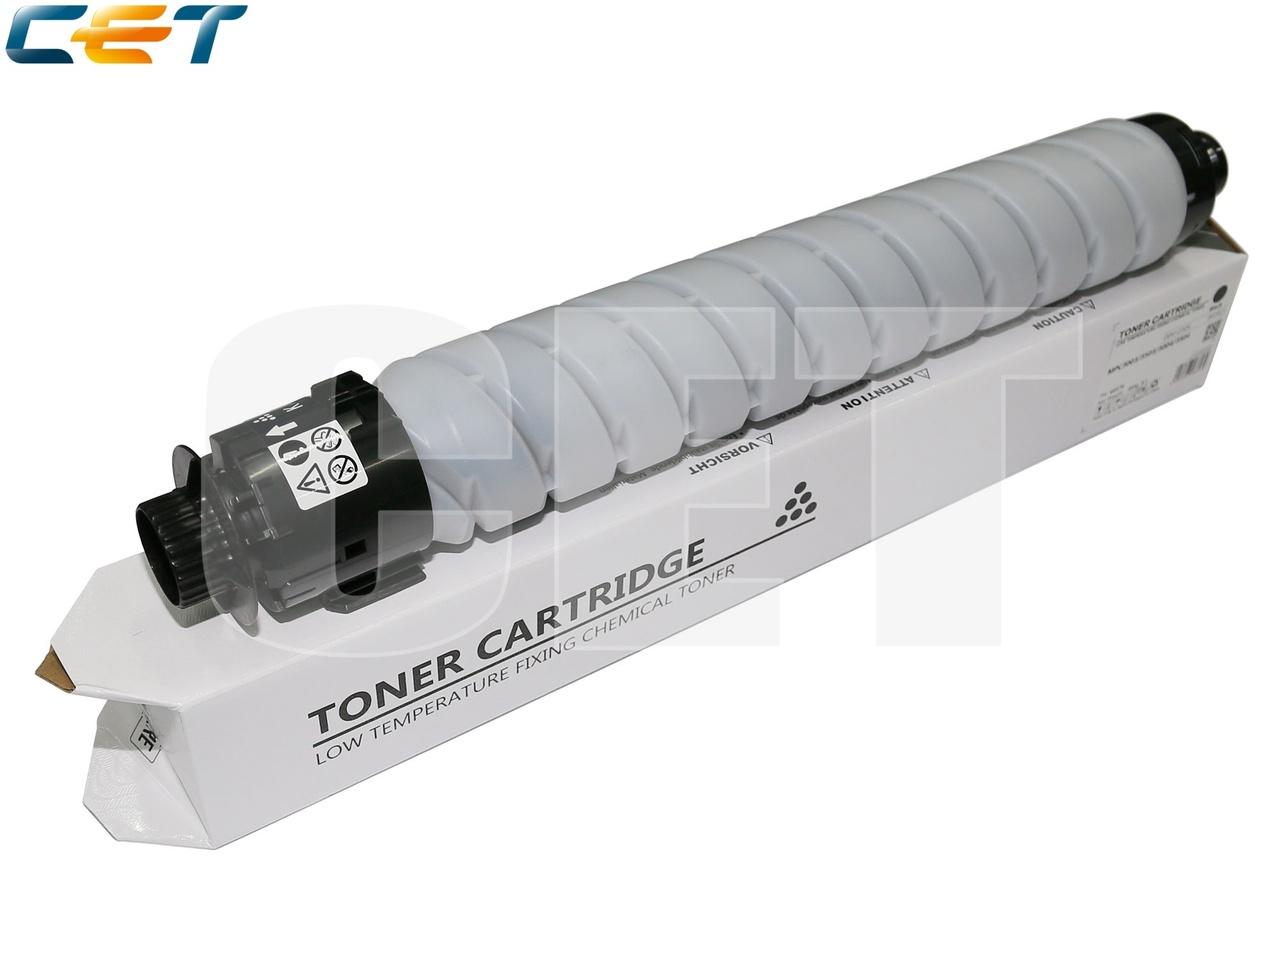 Тонер-картридж (CPT, HT8) 841817 для RICOHMPC3003/3503/3004/3504 (CET) Black, 495г, 29500 стр.,CET6857K